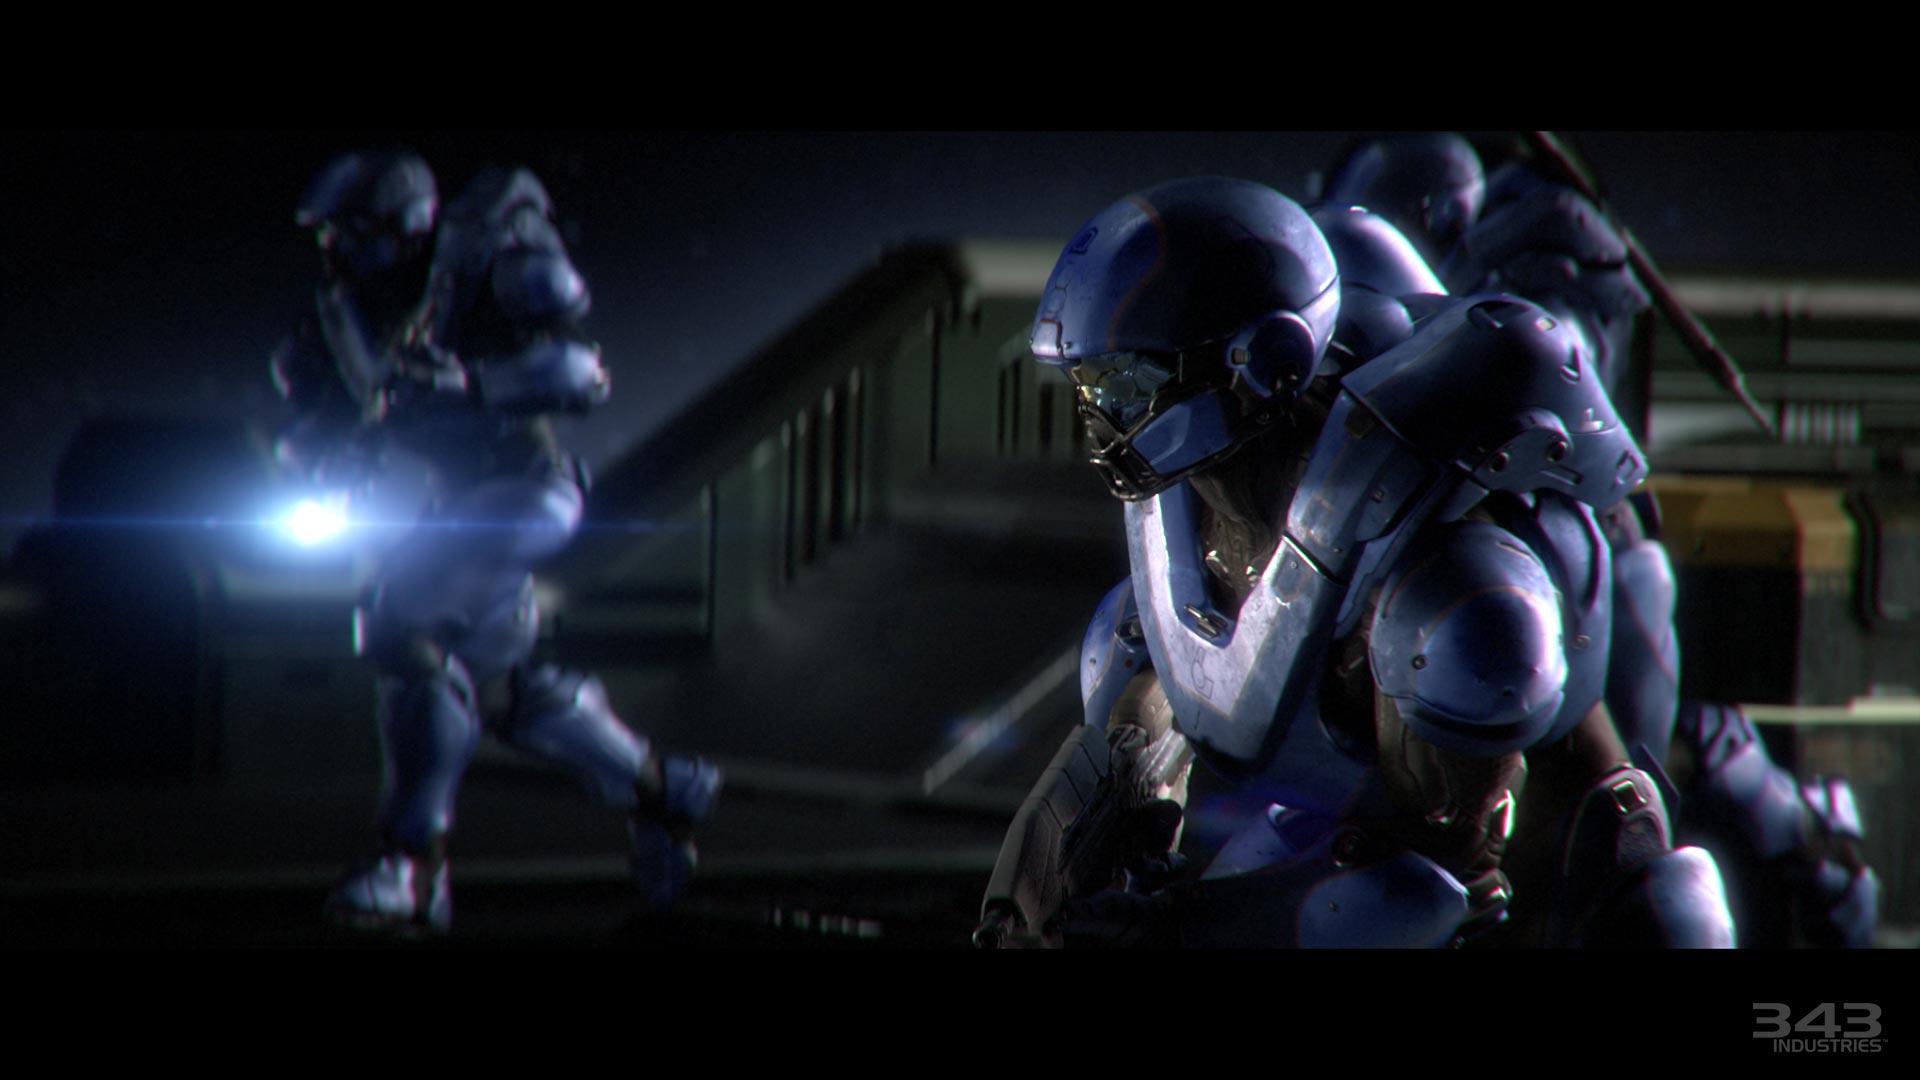 Halo 2 multiplayer edition